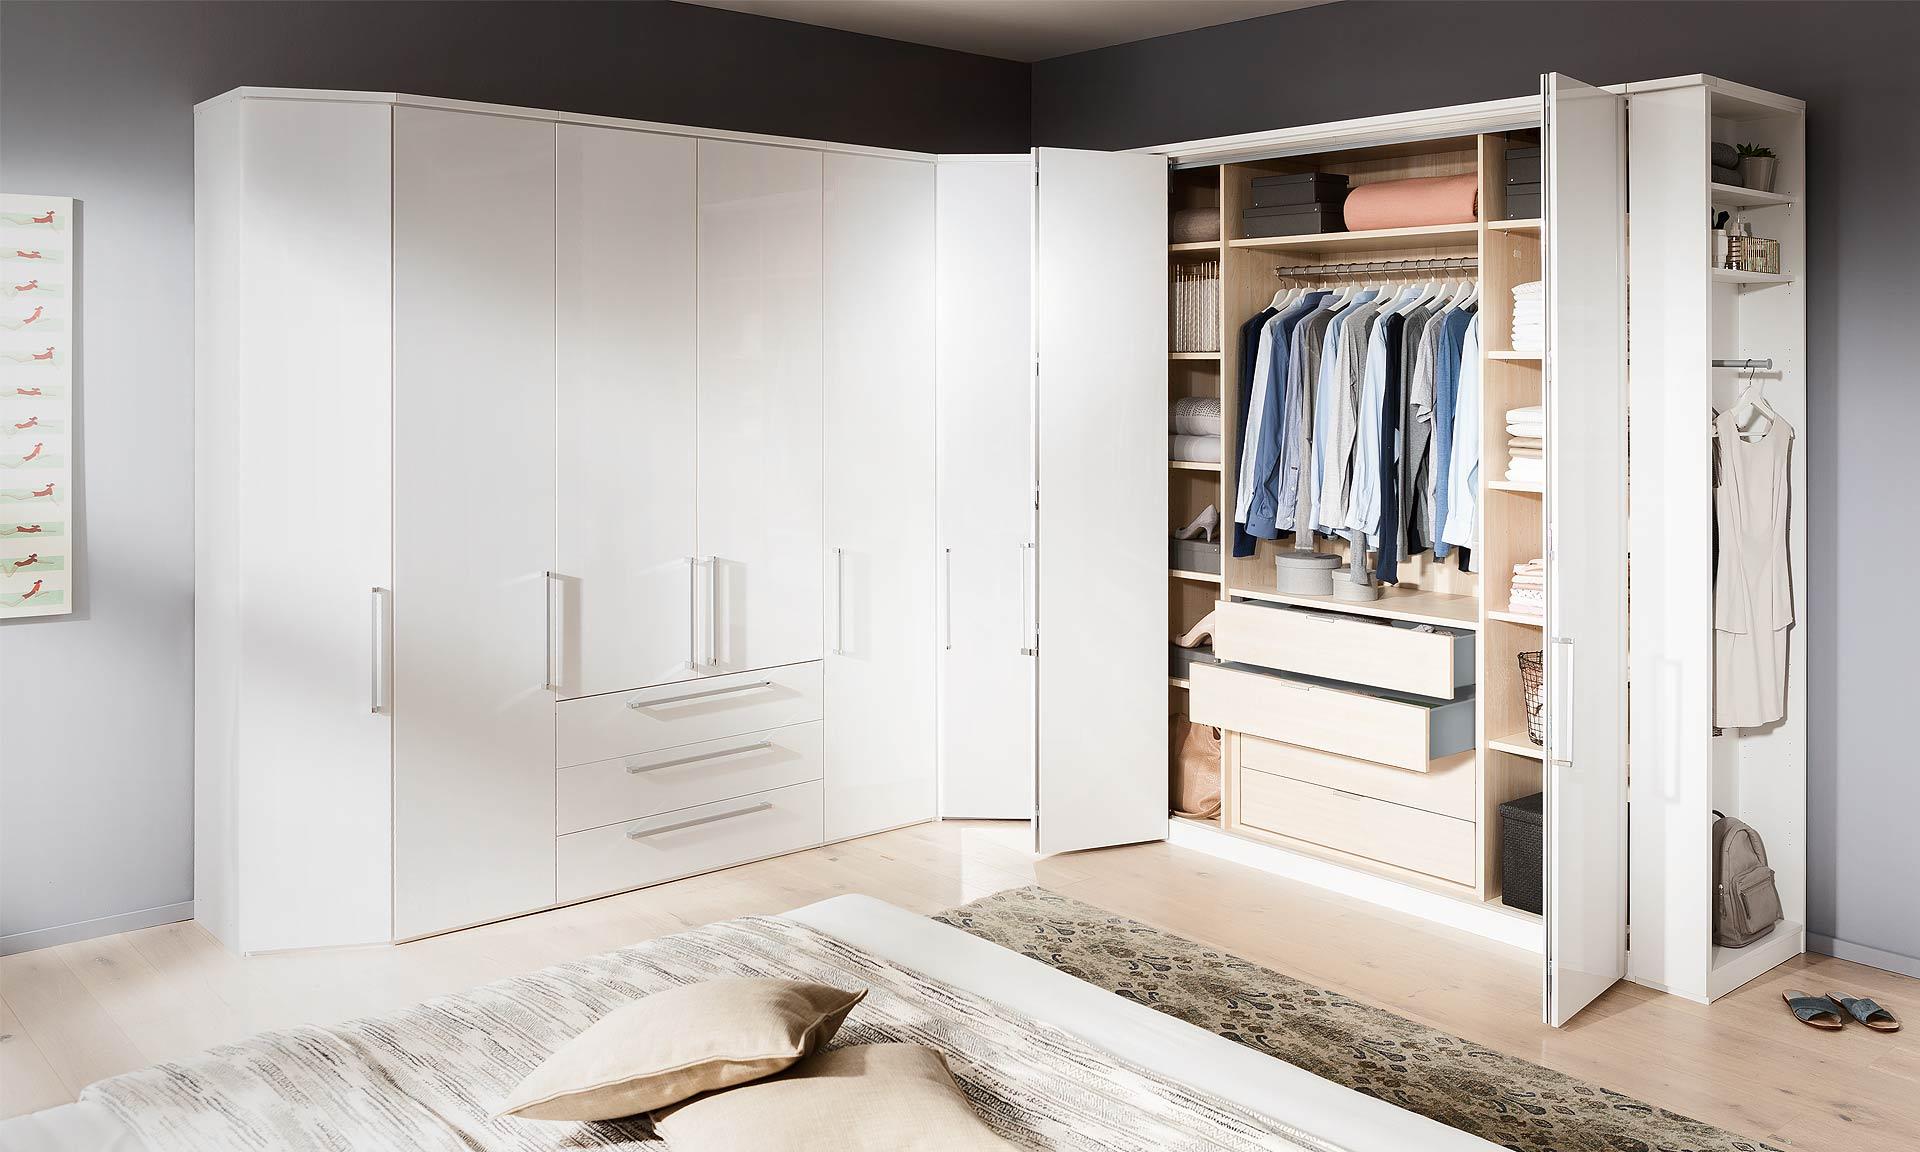 armoire dressing personnalisable selon